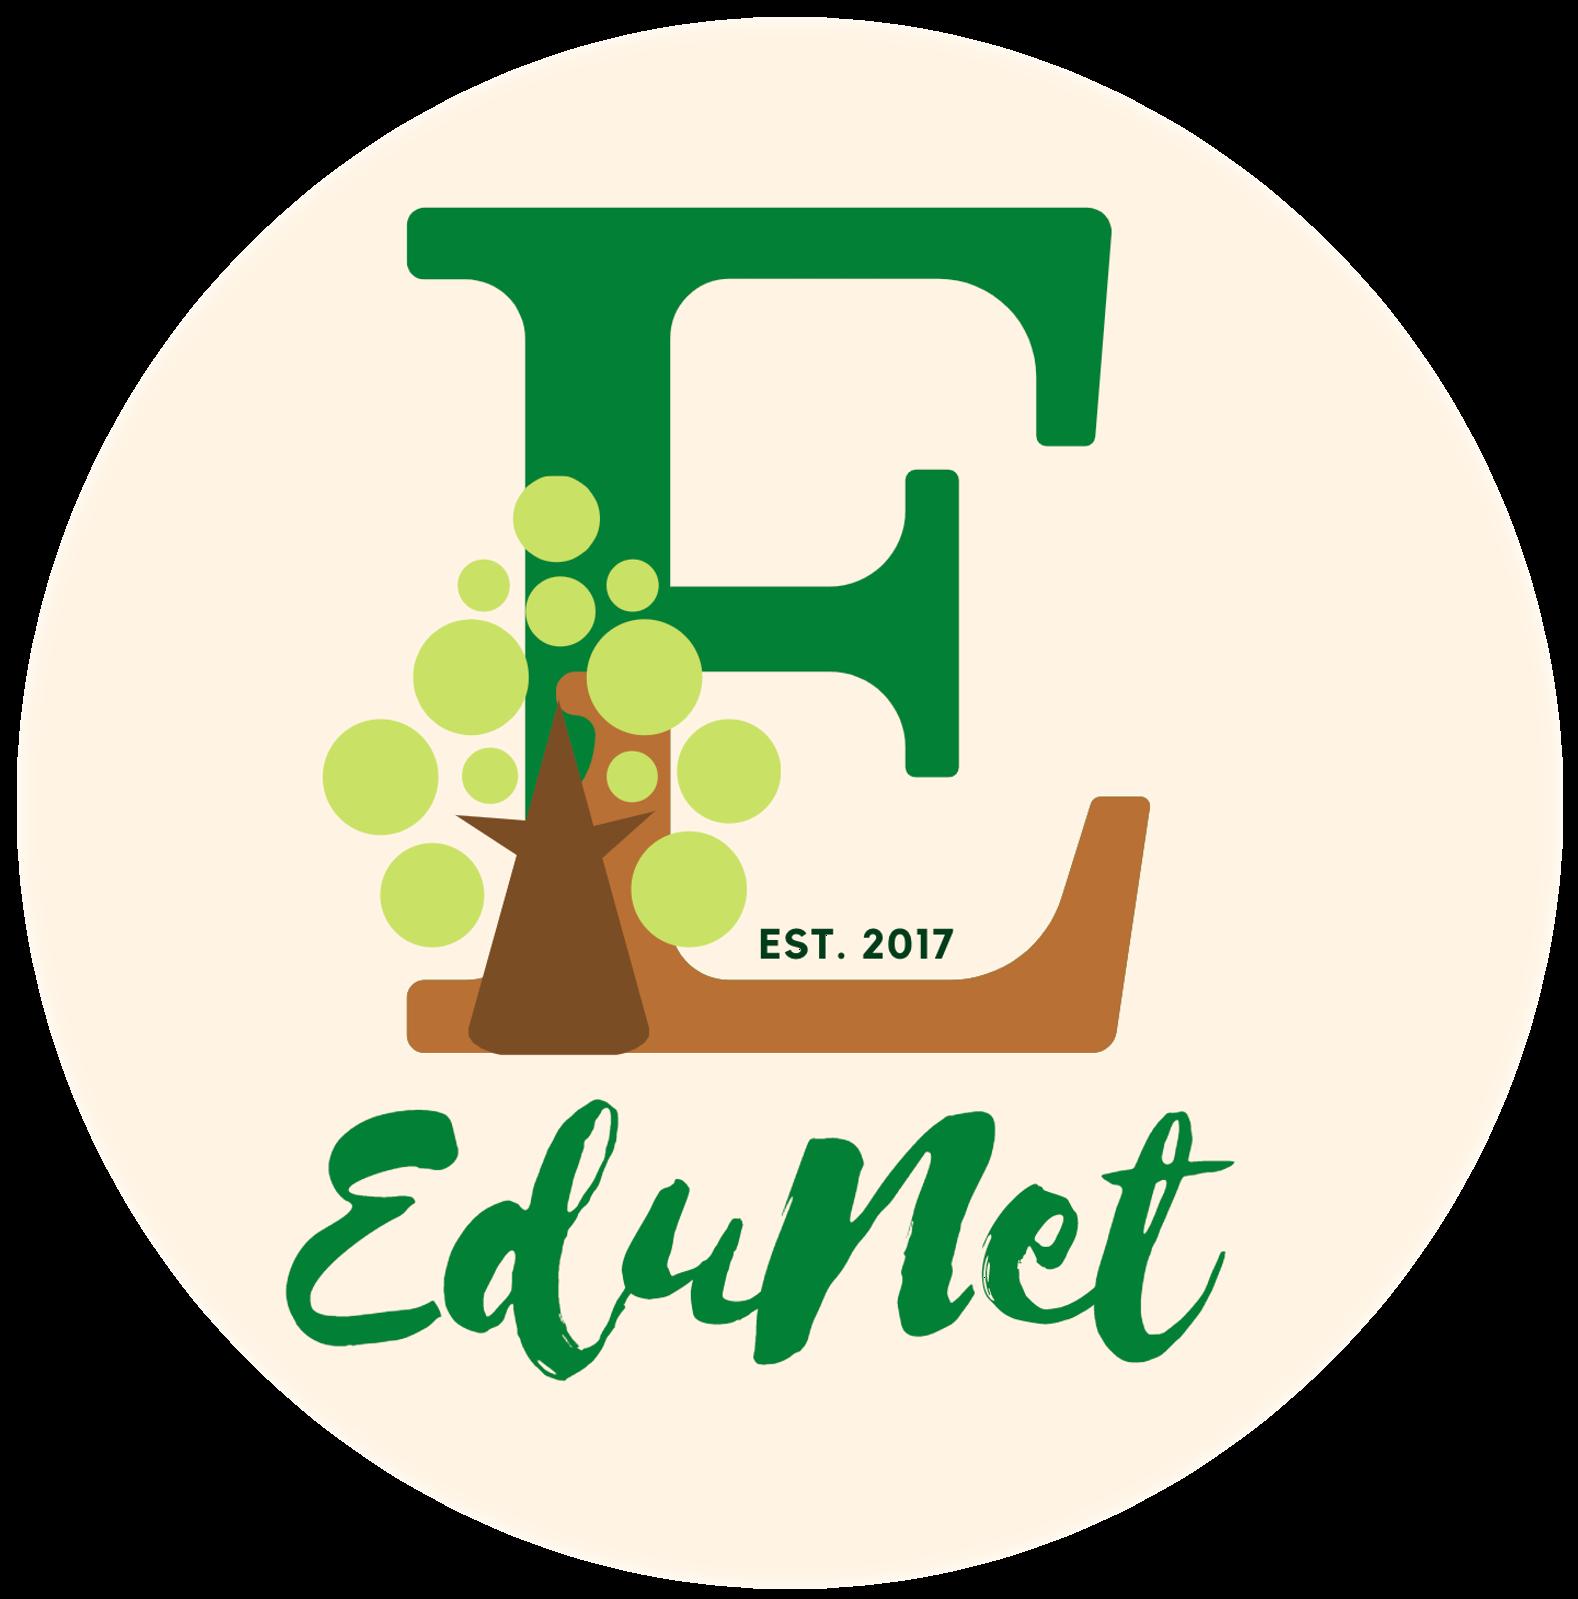 EduNet